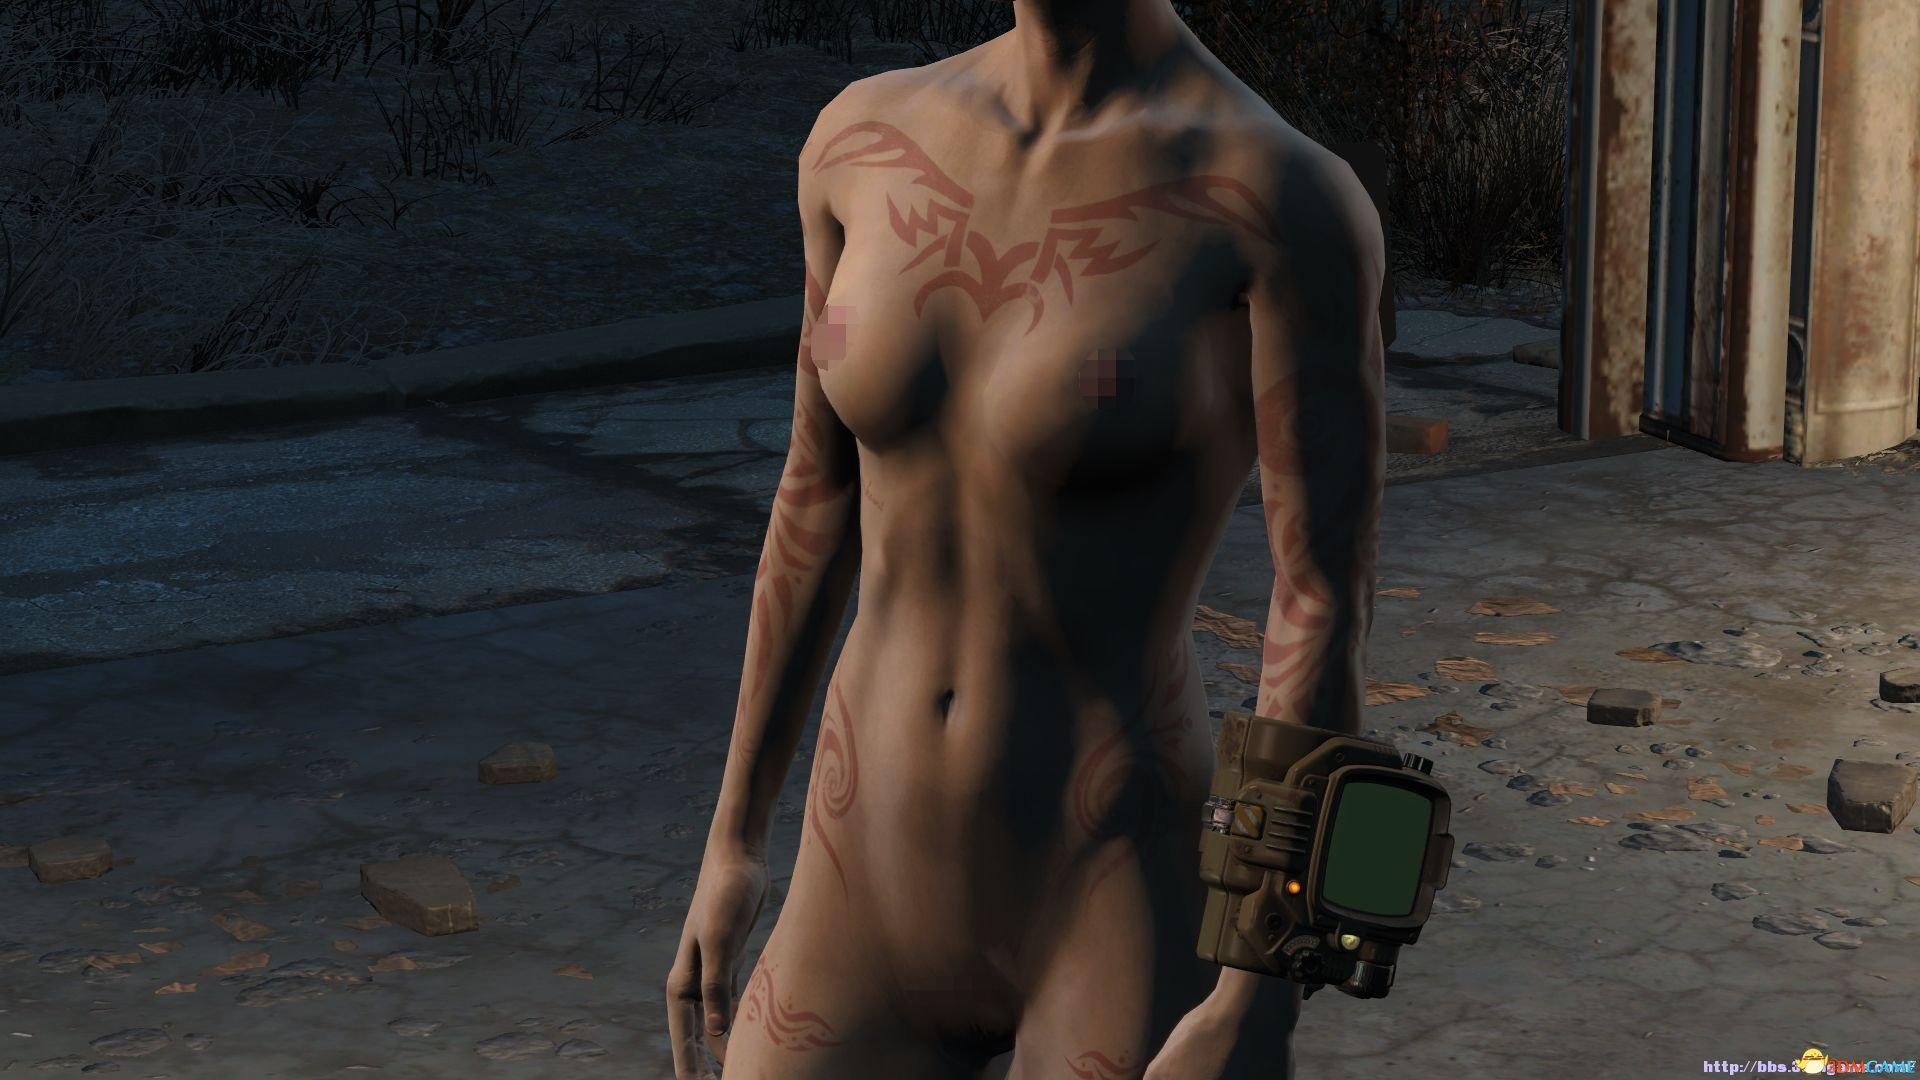 d女性果体图腾纹身mod